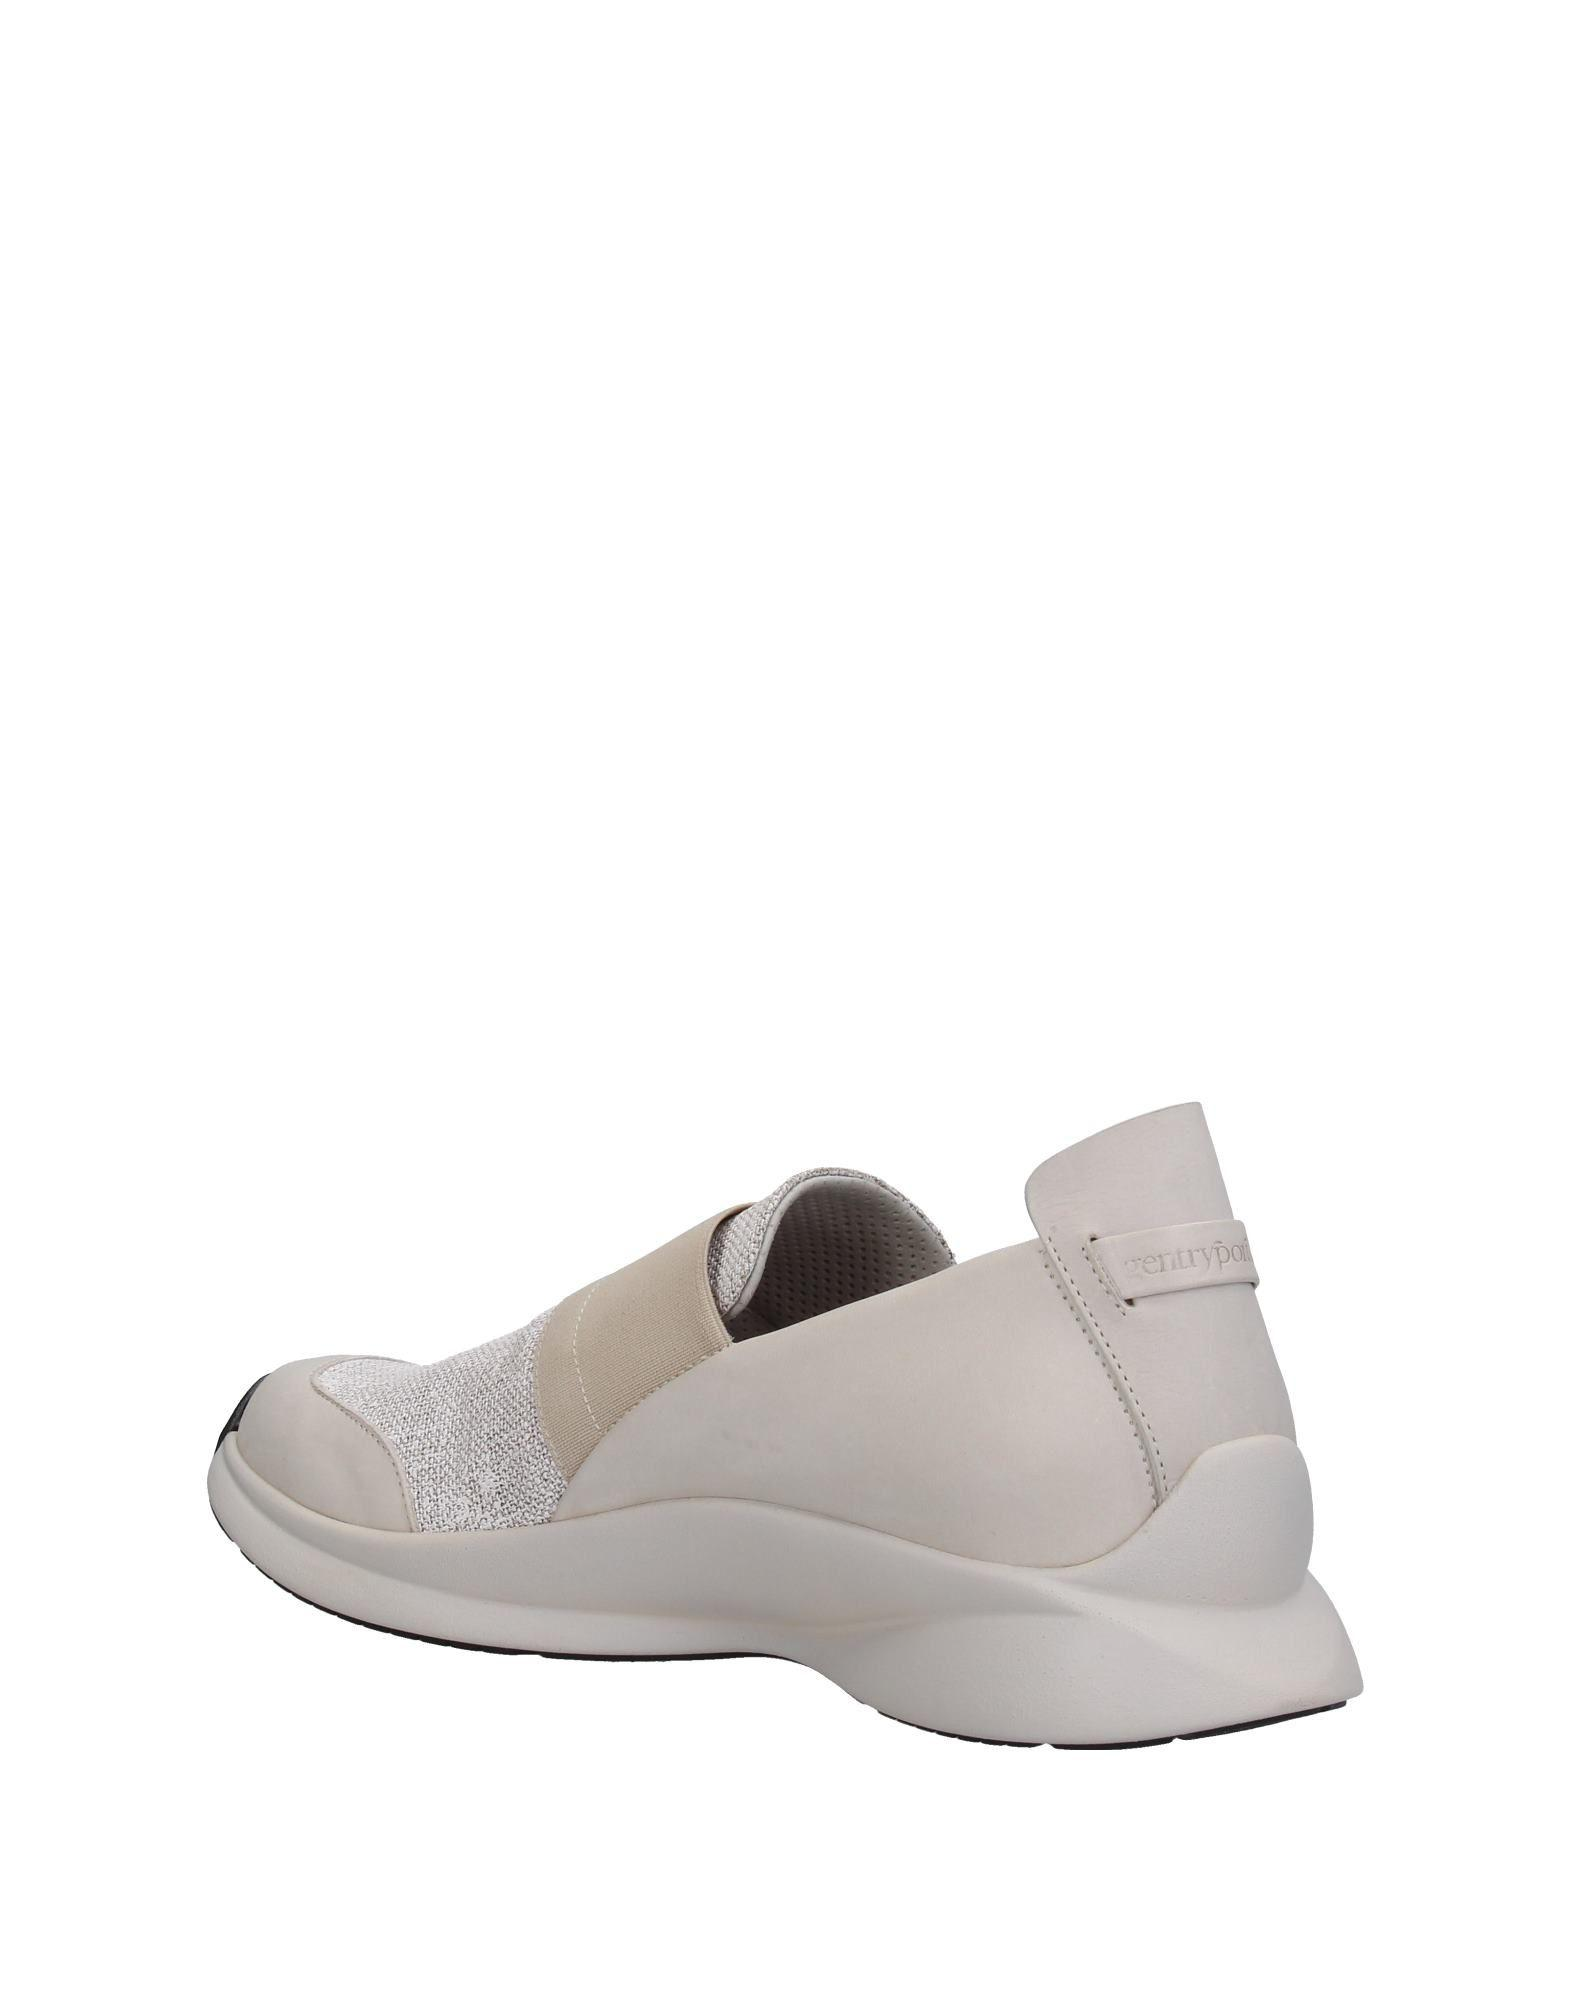 Gentry Portofino Leather Low-tops & Sneakers in Light Grey (Grey)